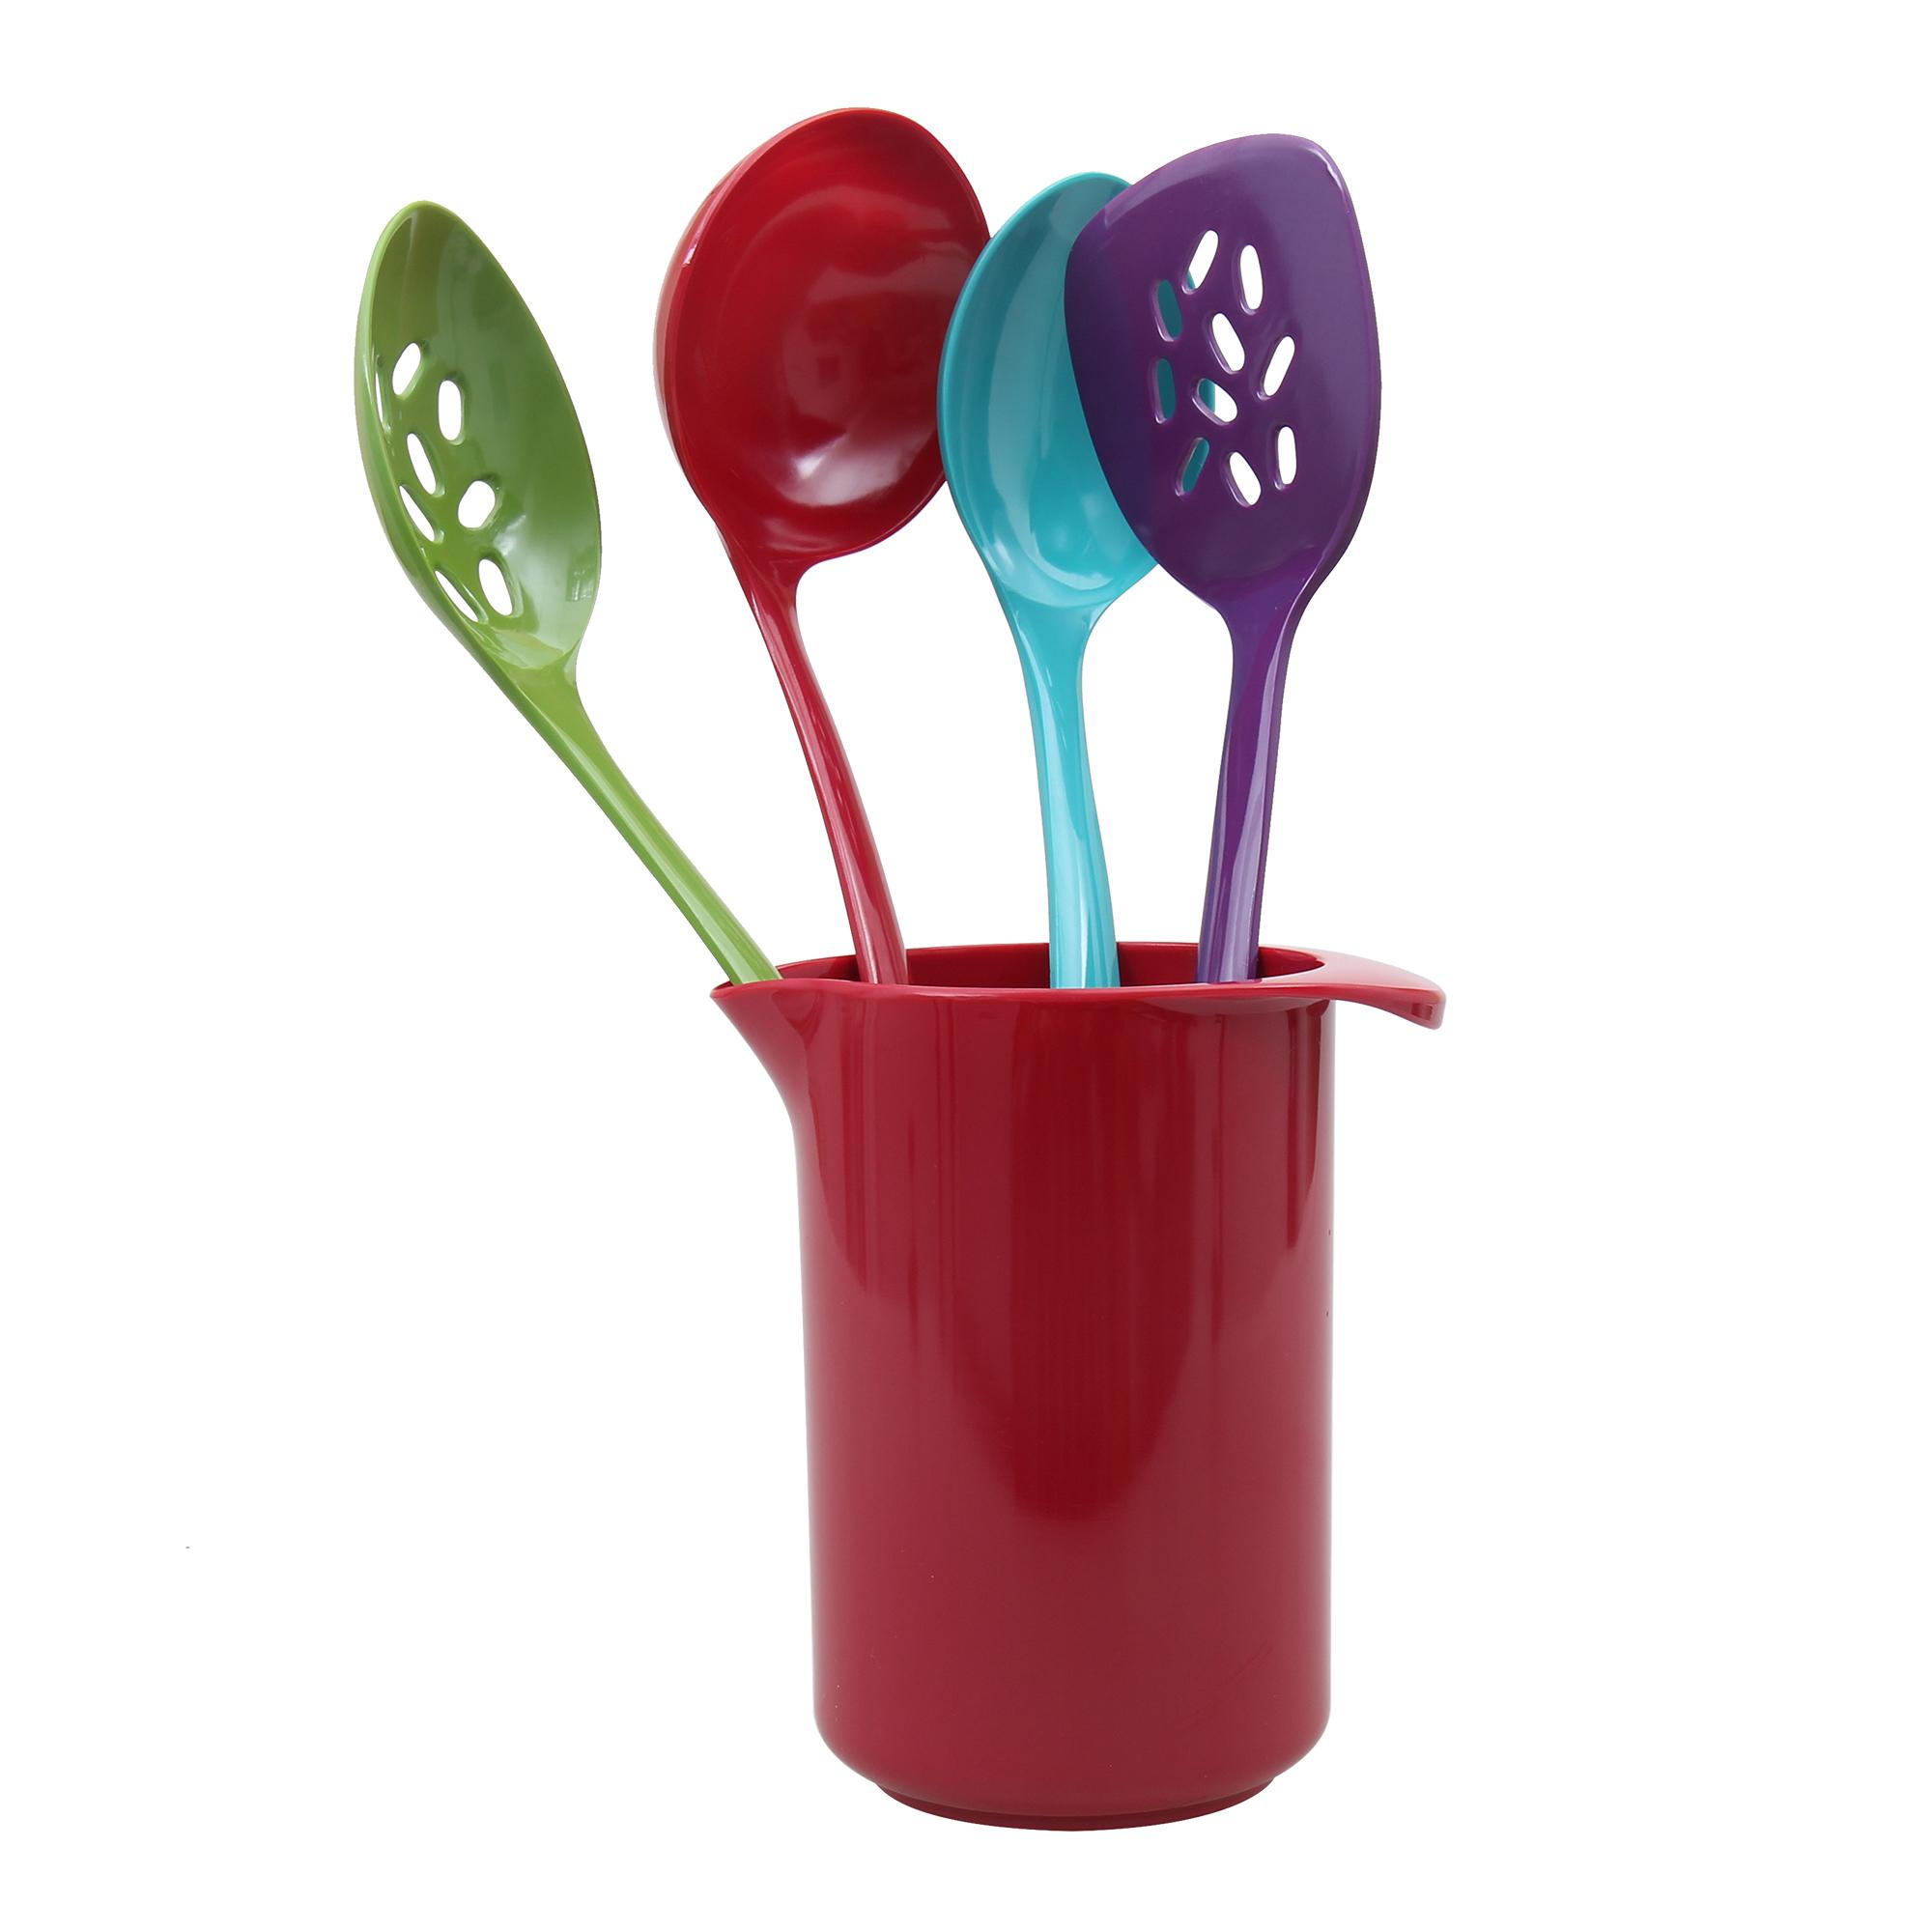 Buenisimo 5 piece Kitchen Utensil Set, Dishwasher Safe